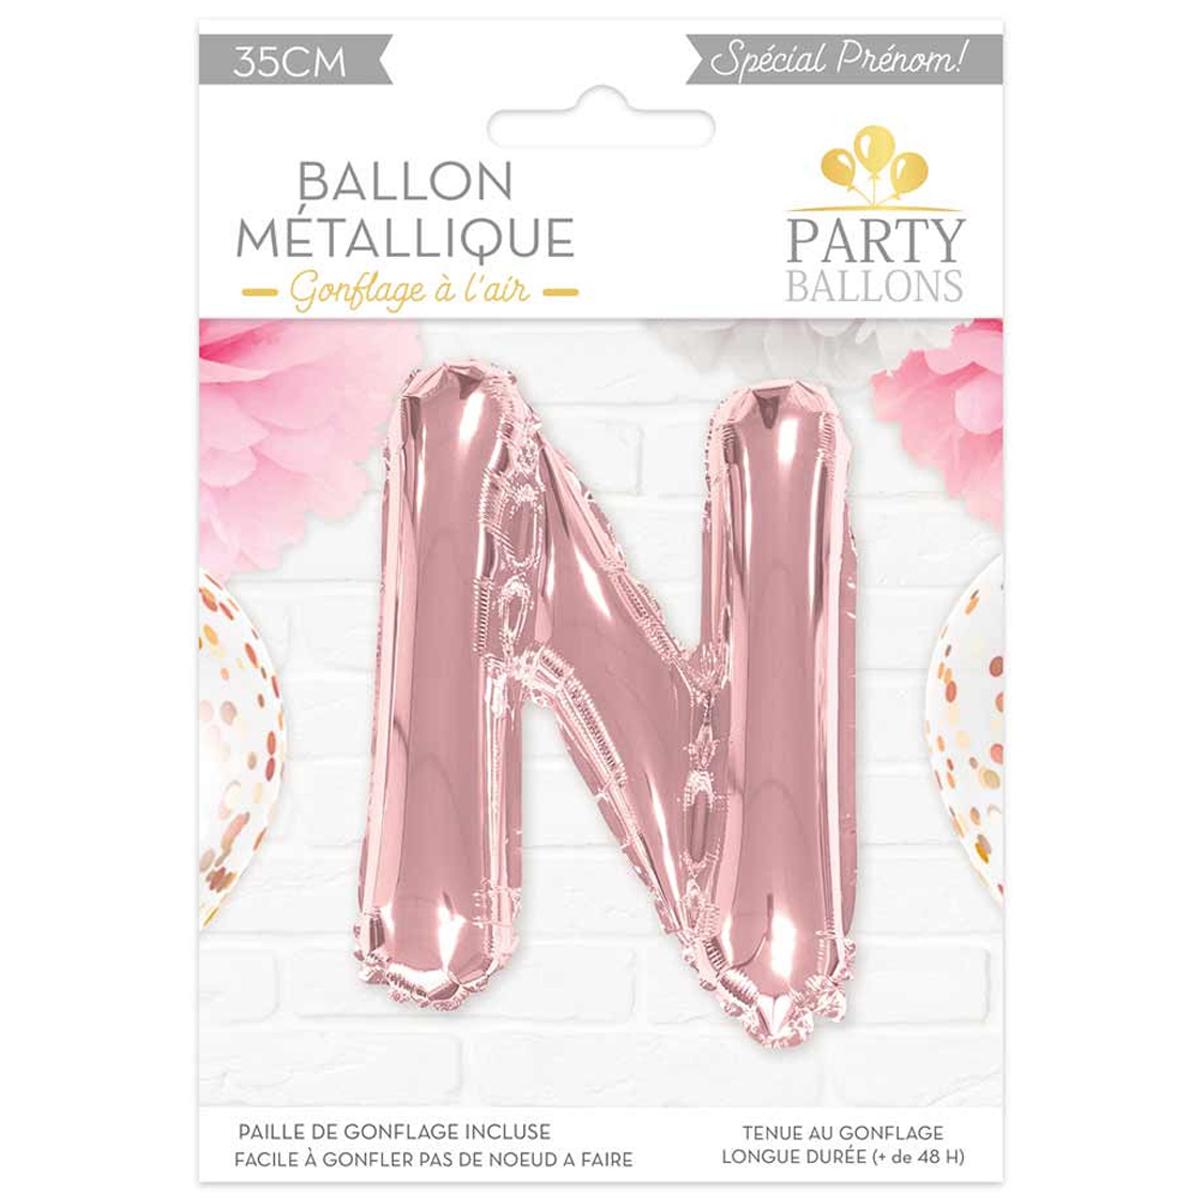 Ballon métallique \'Lettre N\' rosé - 35 cm - [A0444]